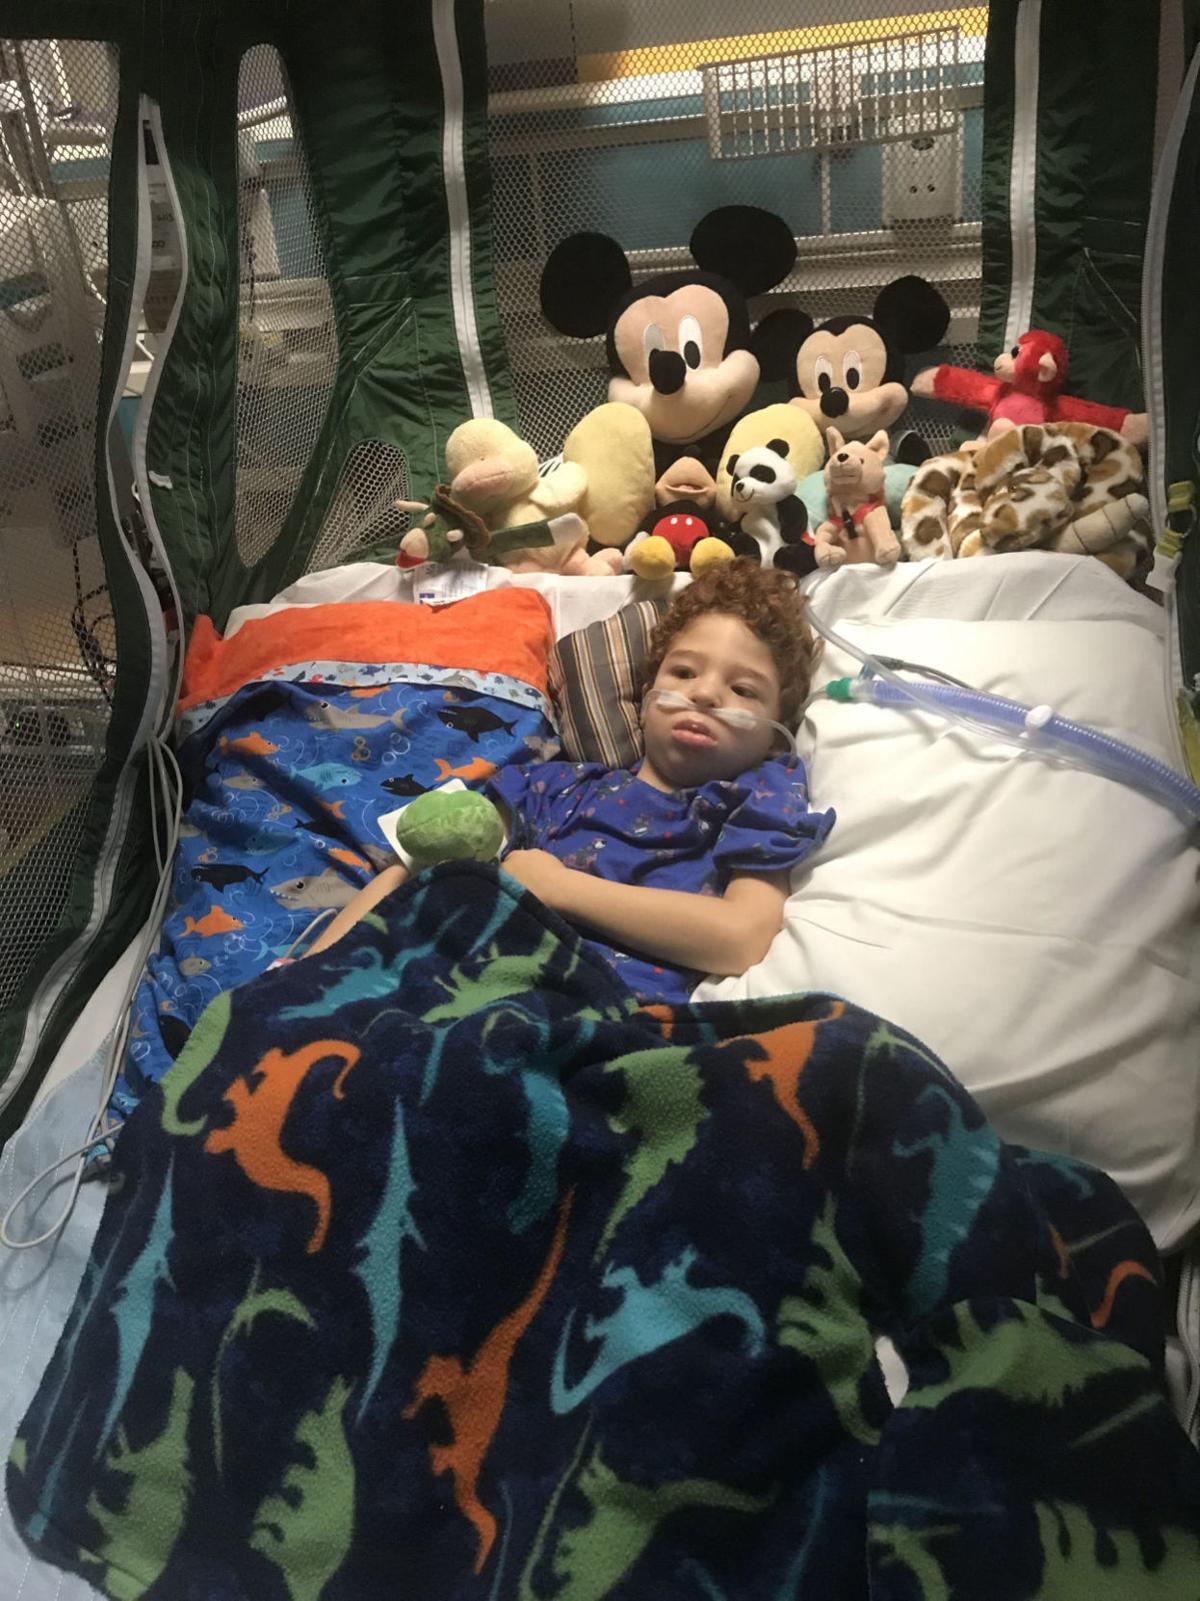 Mistaken text from a stranger leads Arizona man to raise money for sick boy